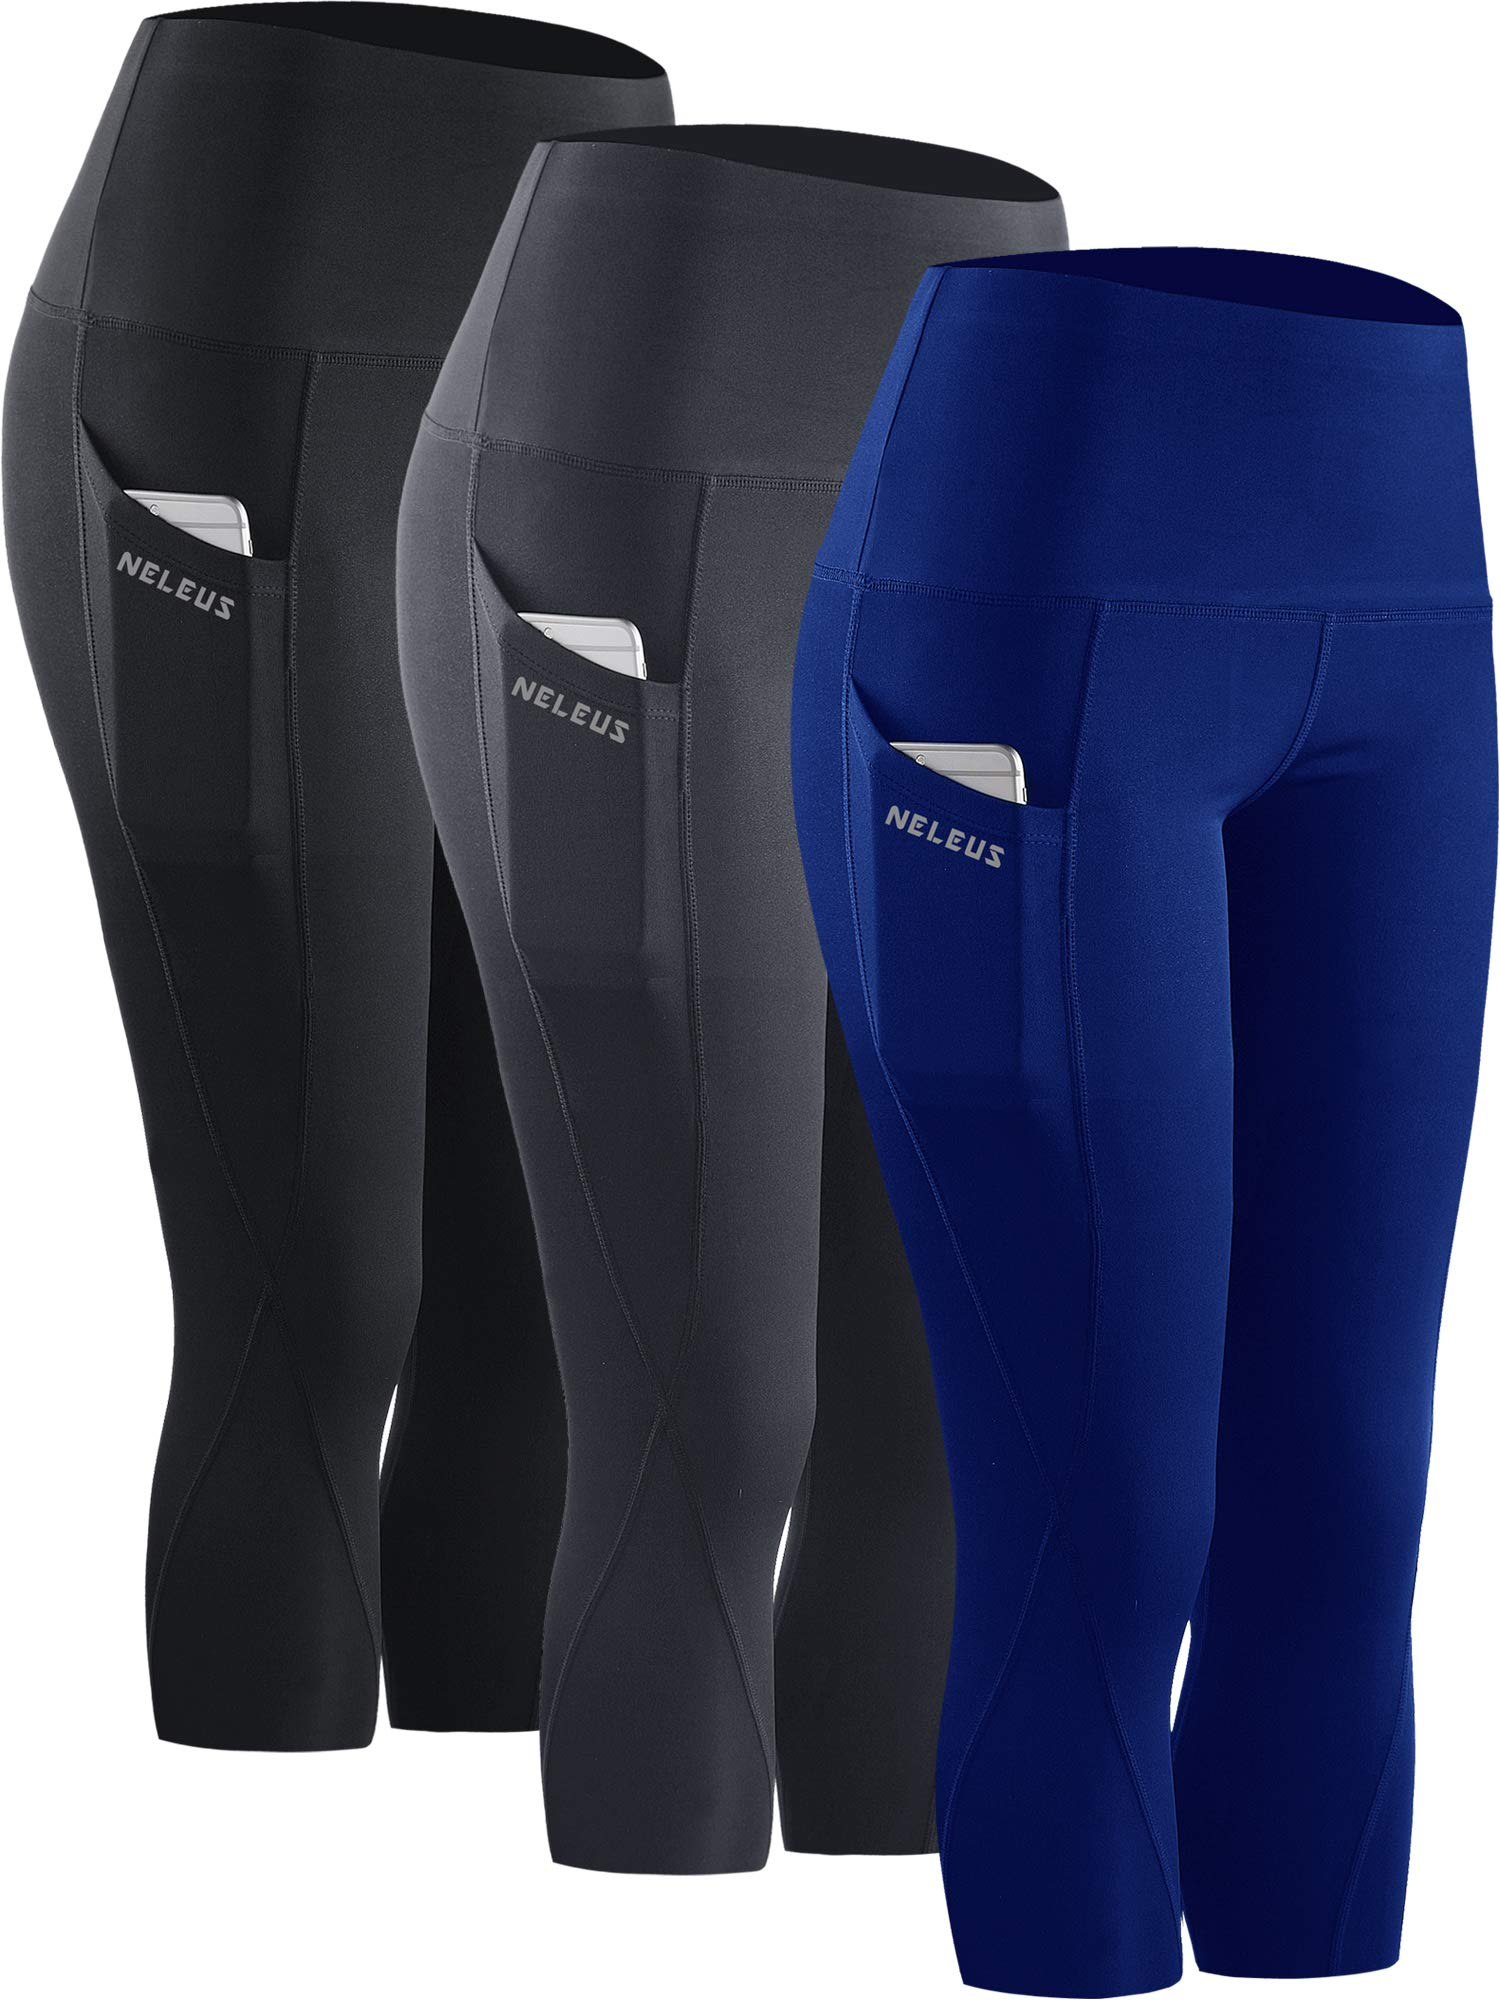 Neleus 3 Pack Workout Running Capris Tummy Control High Waist Yoga Leggings,9027,Black,Grey,Blue,S,EU M